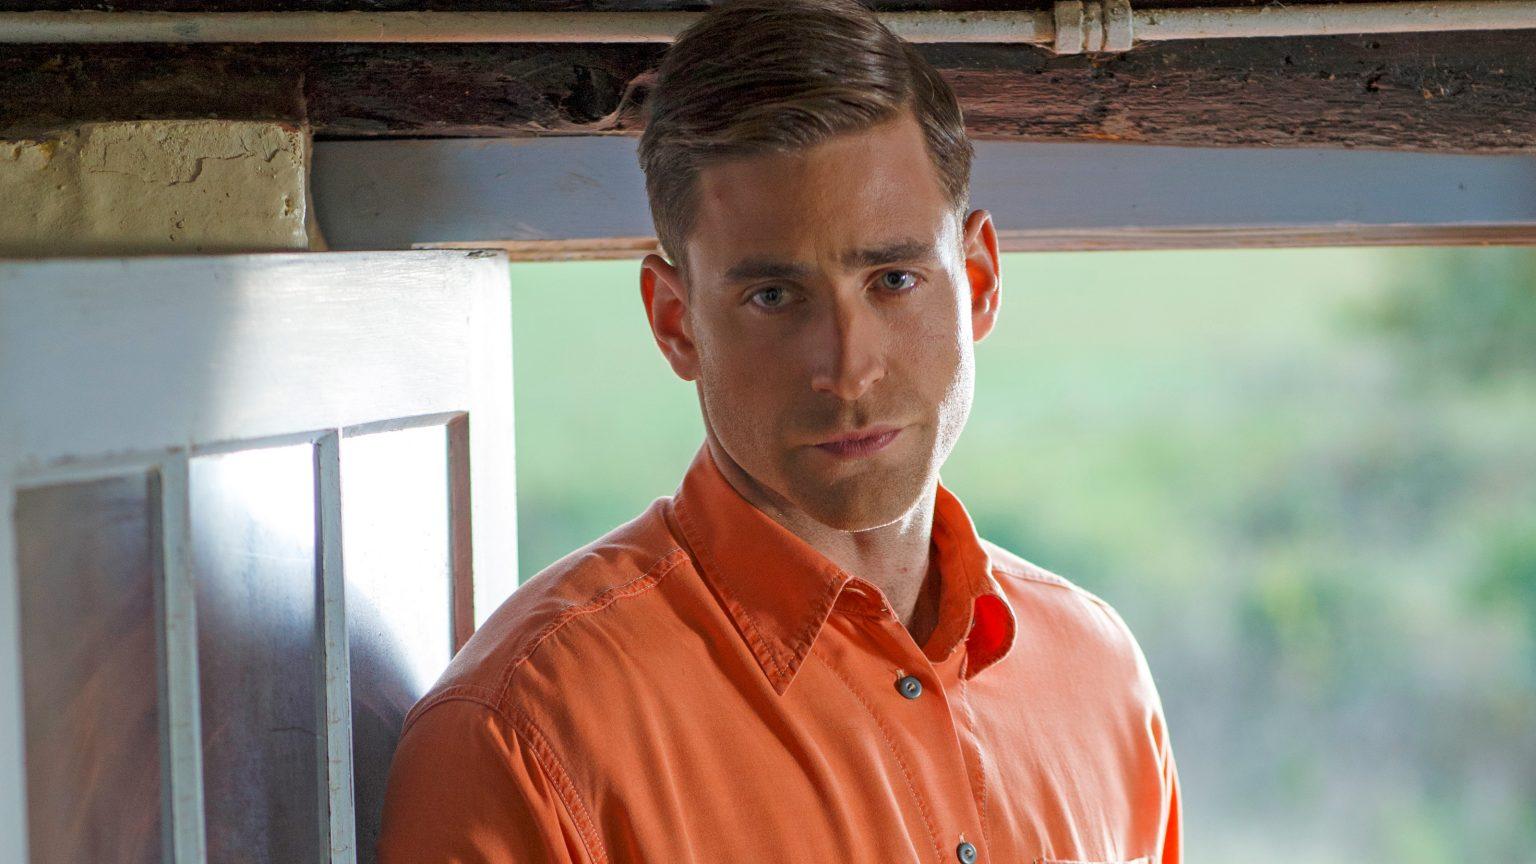 Man in an Orange Shirt - Season 1